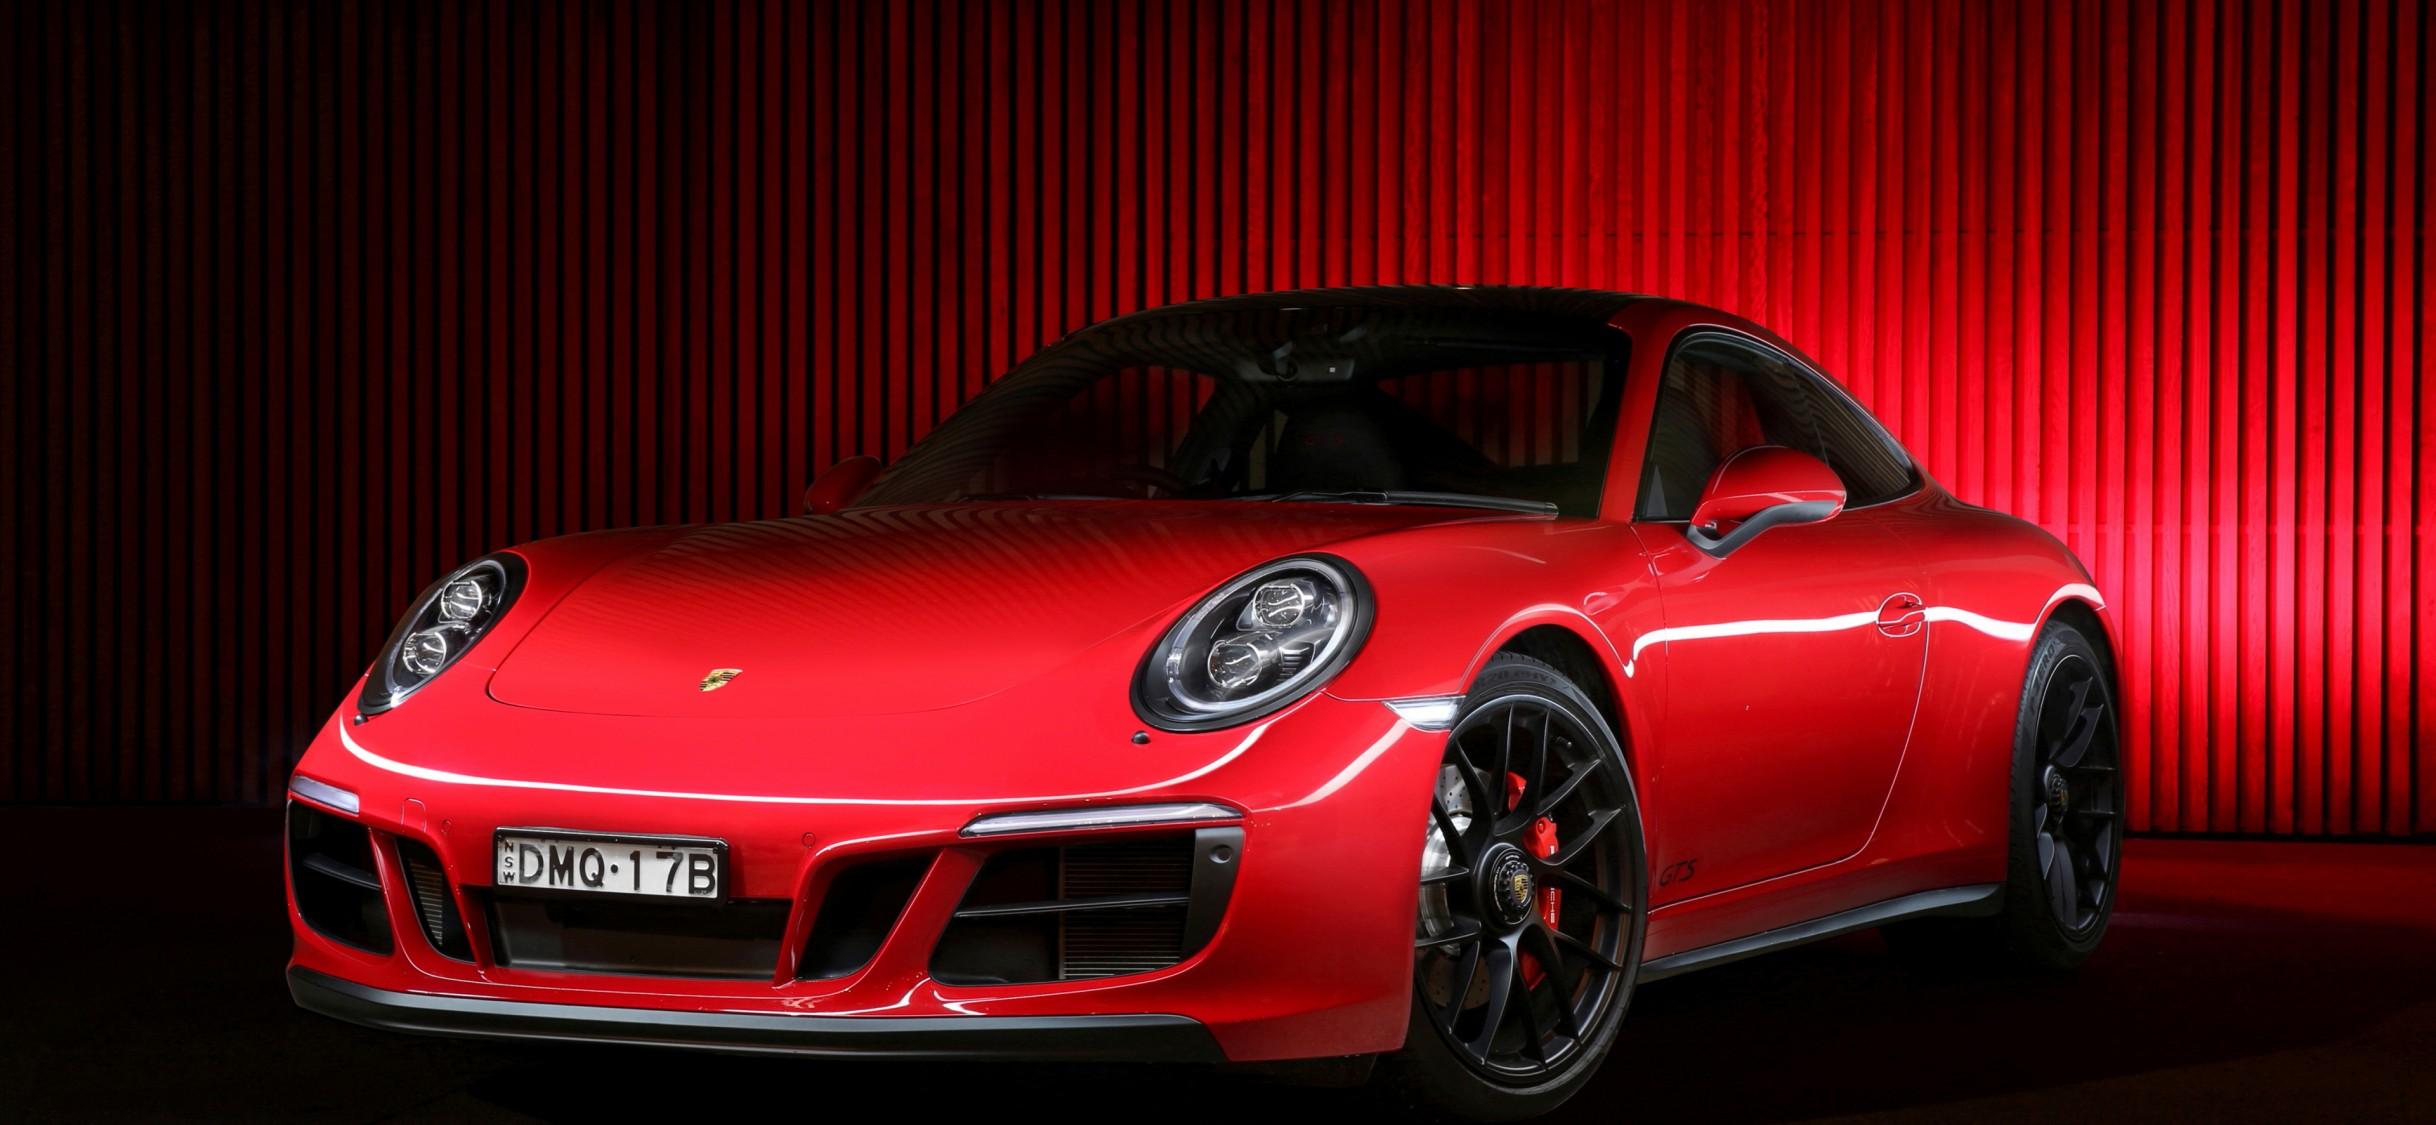 Porsche 911 Wallpaper For Desktop And Mobiles Iphone X Hd